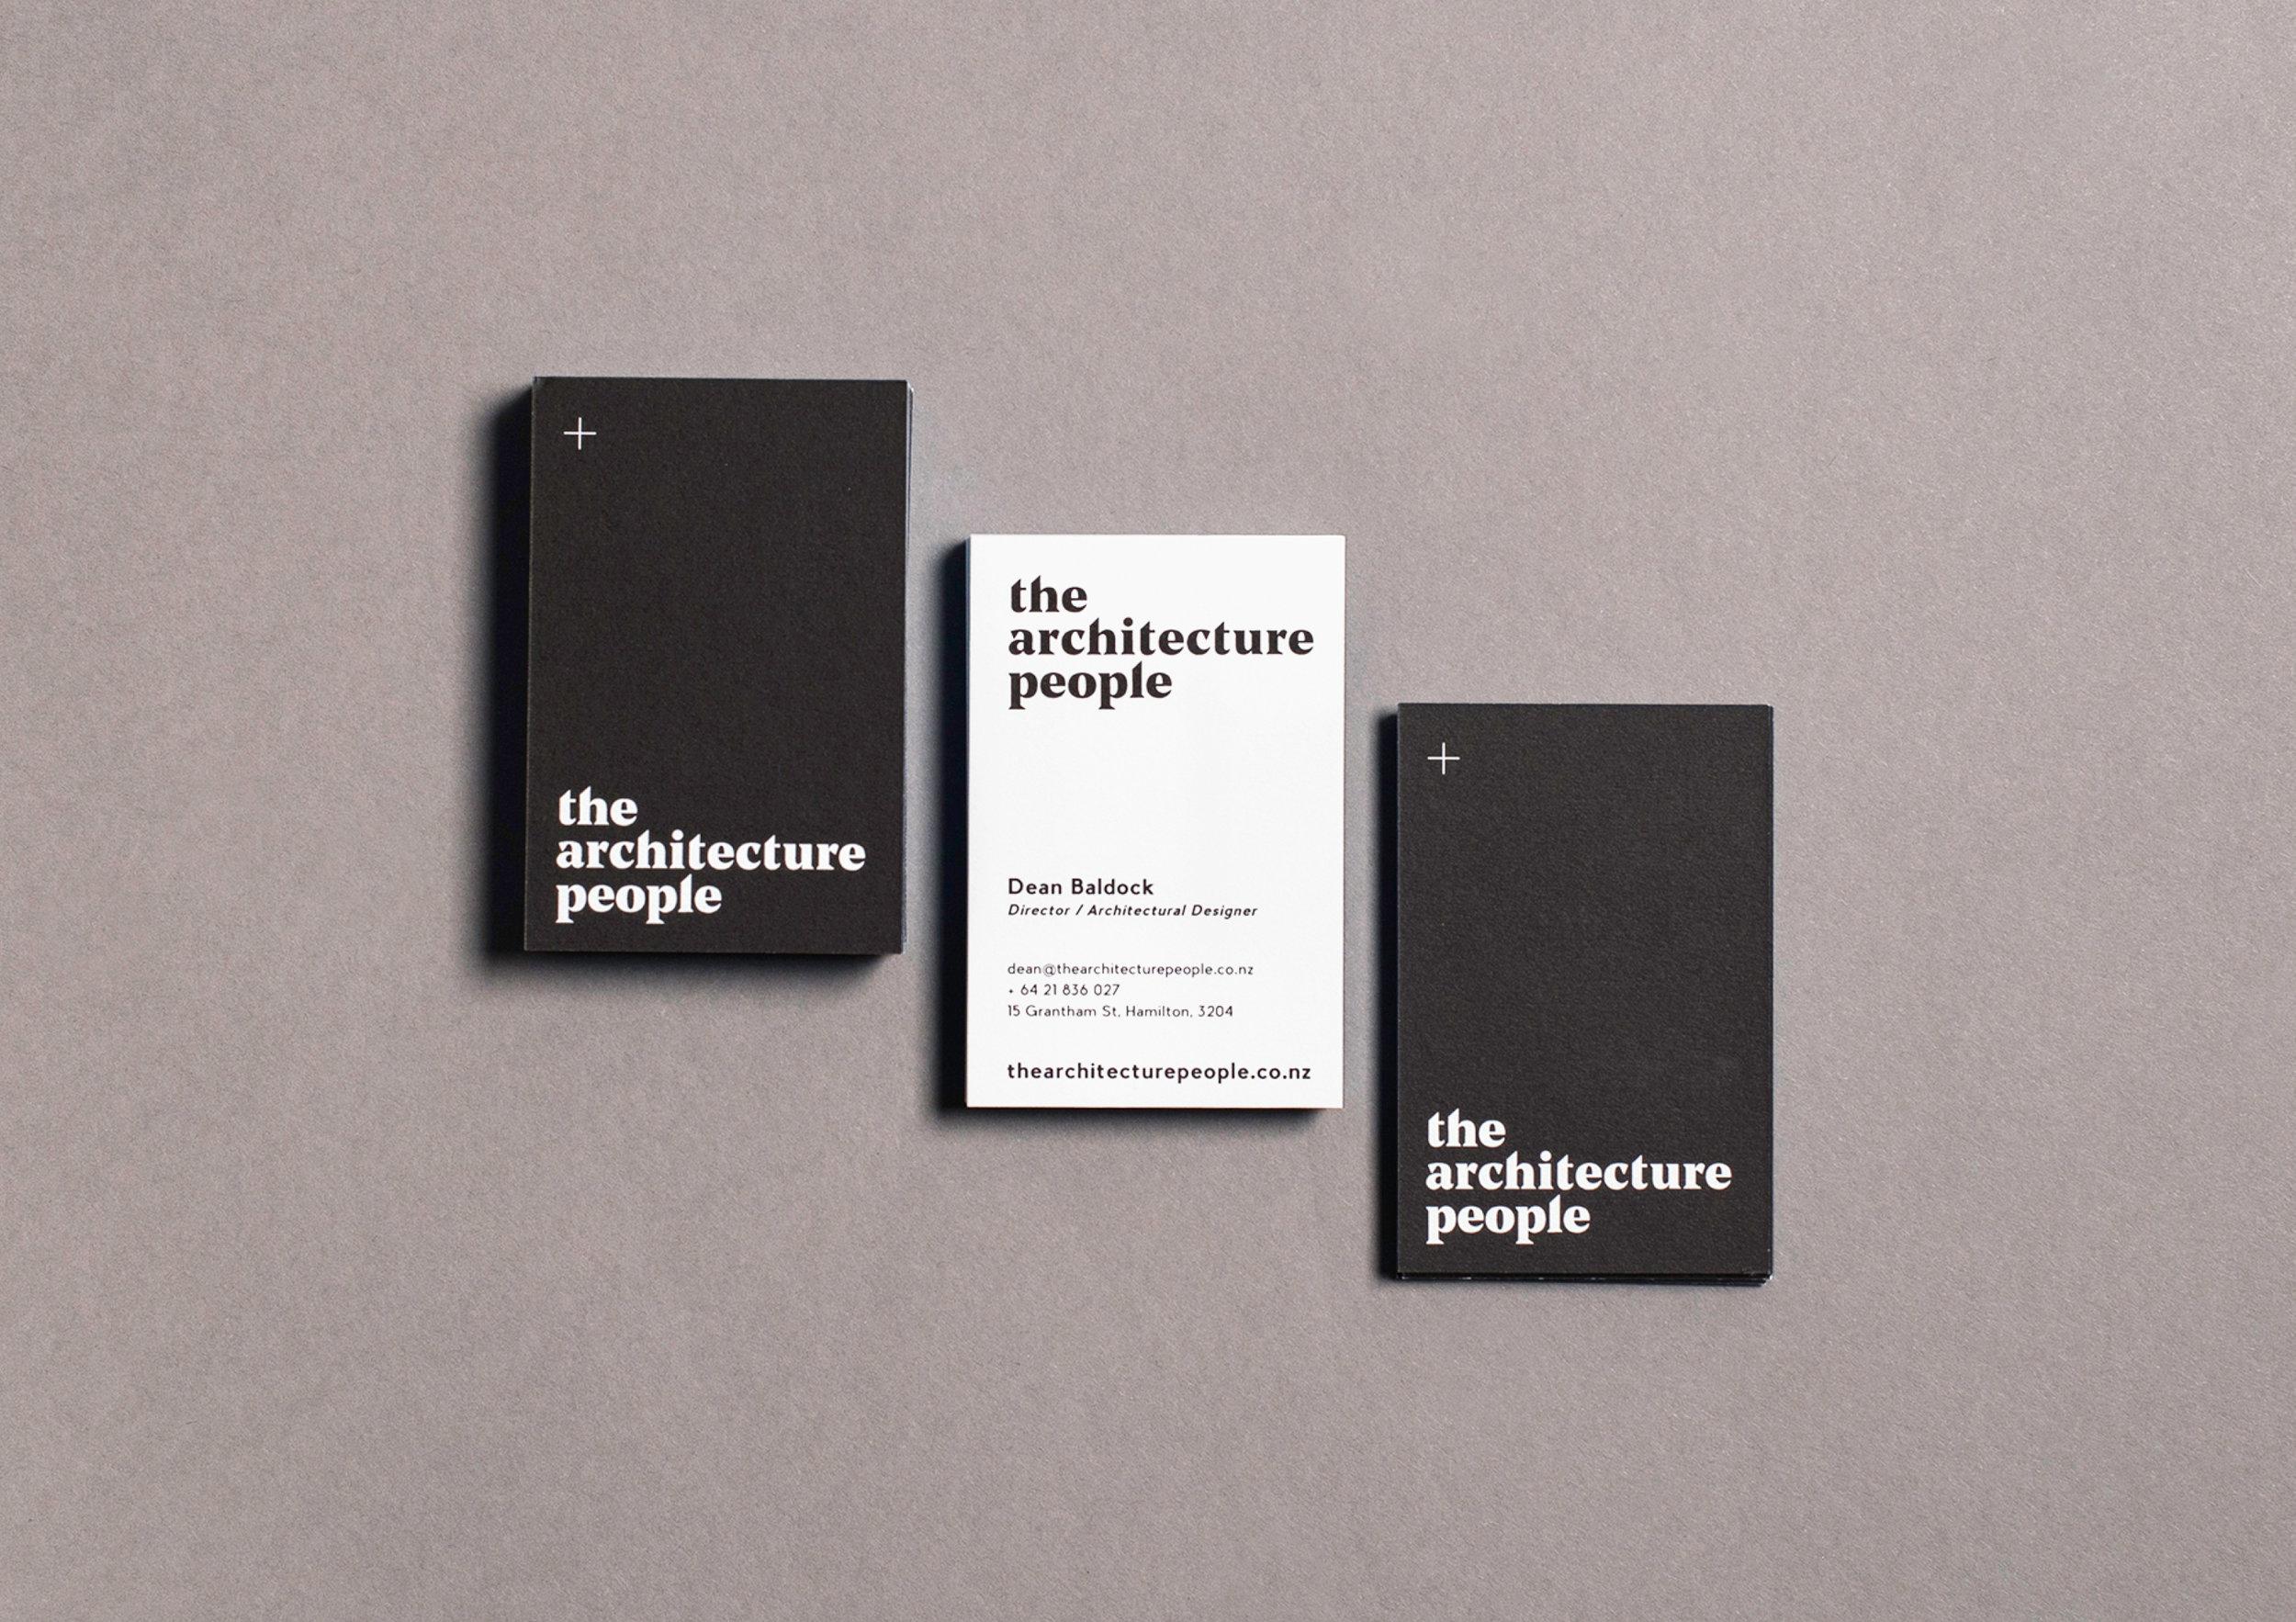 designwell-thearchitecturepeople-branding5.jpg